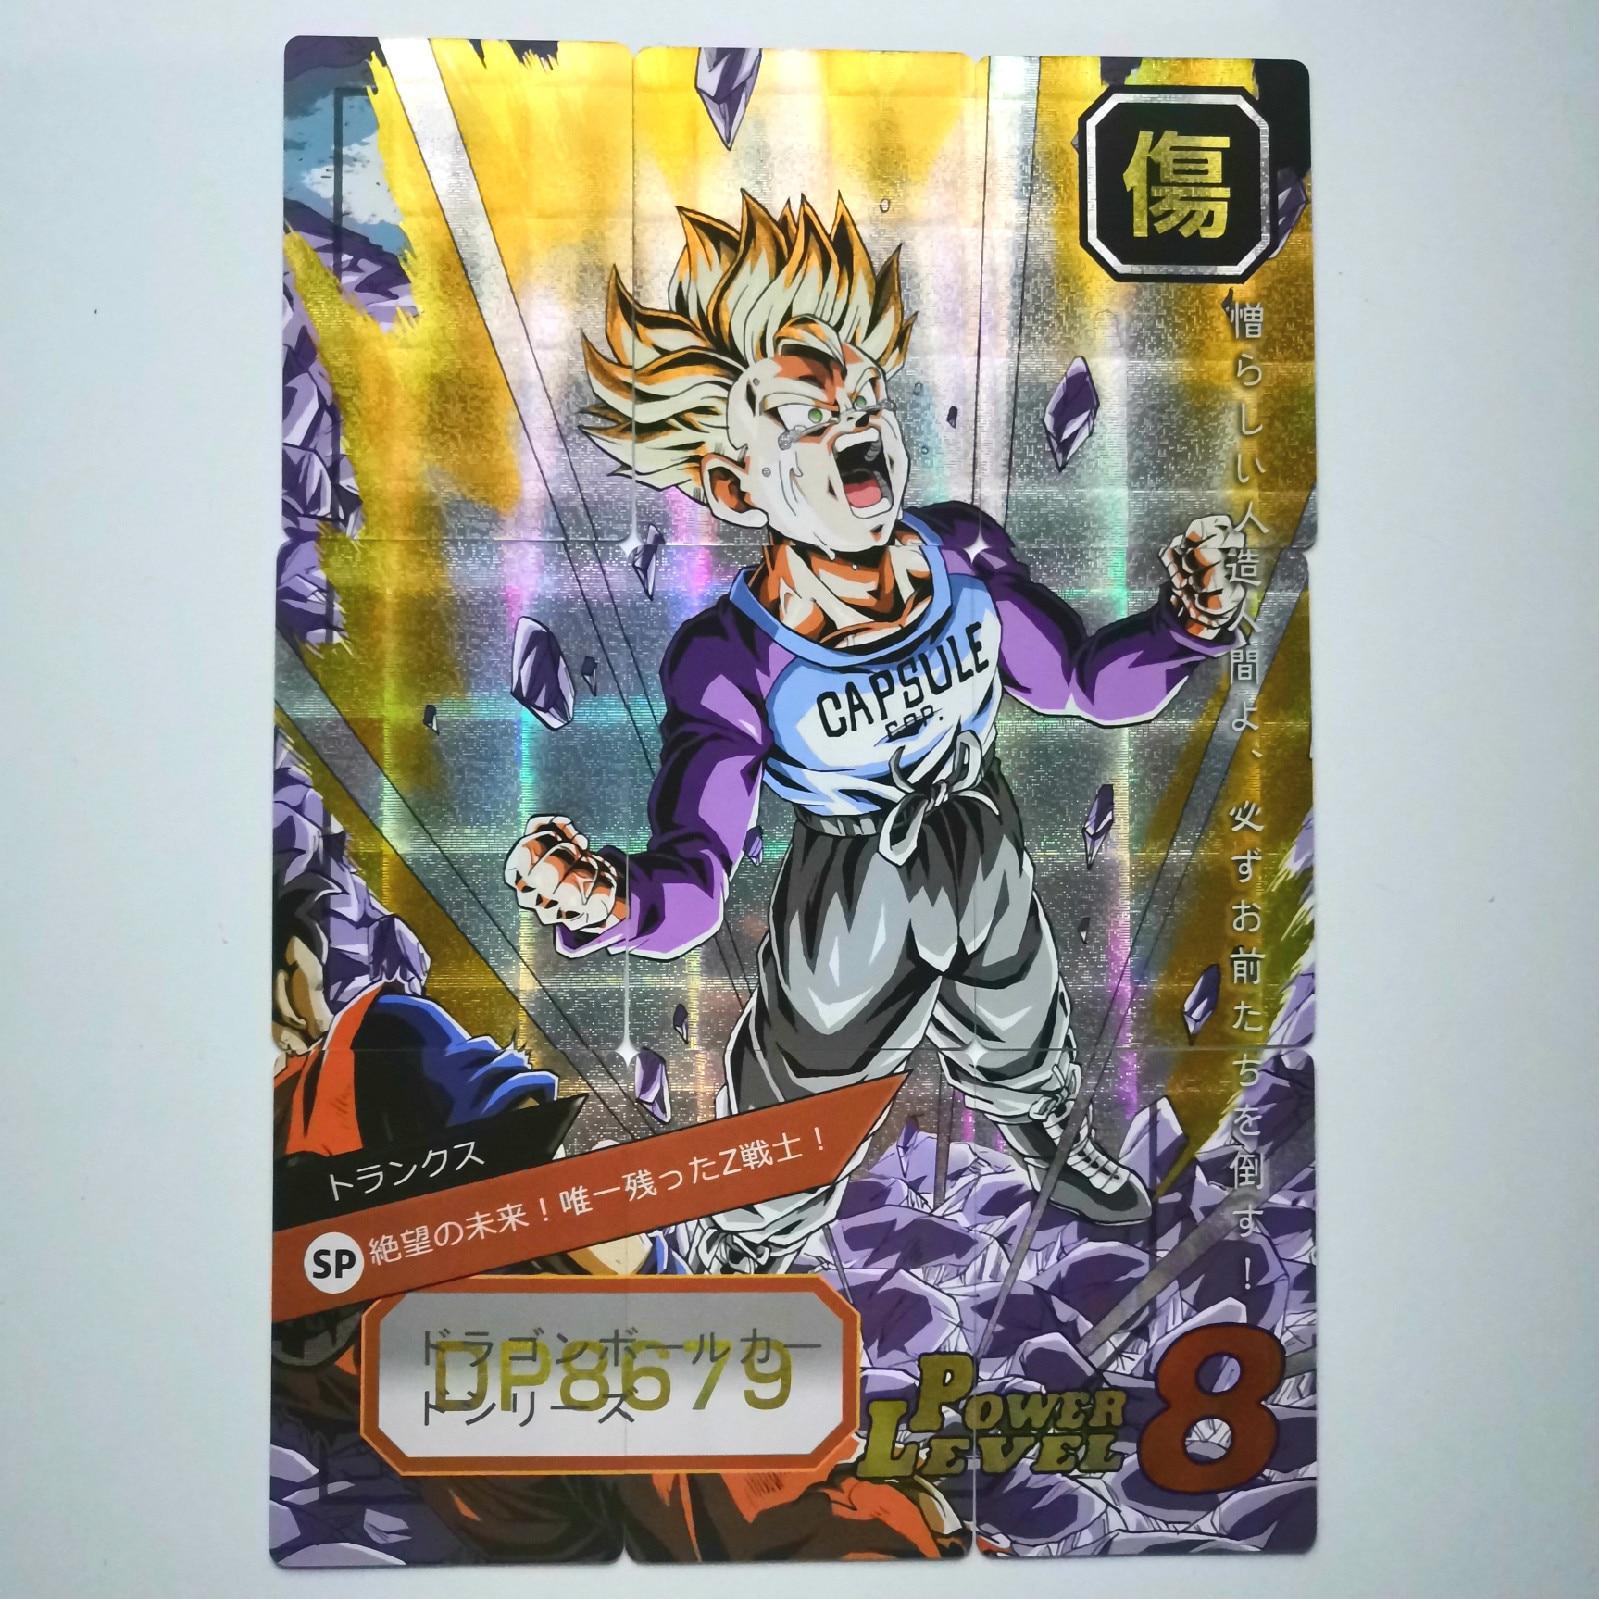 54pcs 9 In 1 Super Dragon Ball Z Heroes Battle Card Ultra Instinct Goku Vegeta Super Game Collection Cards